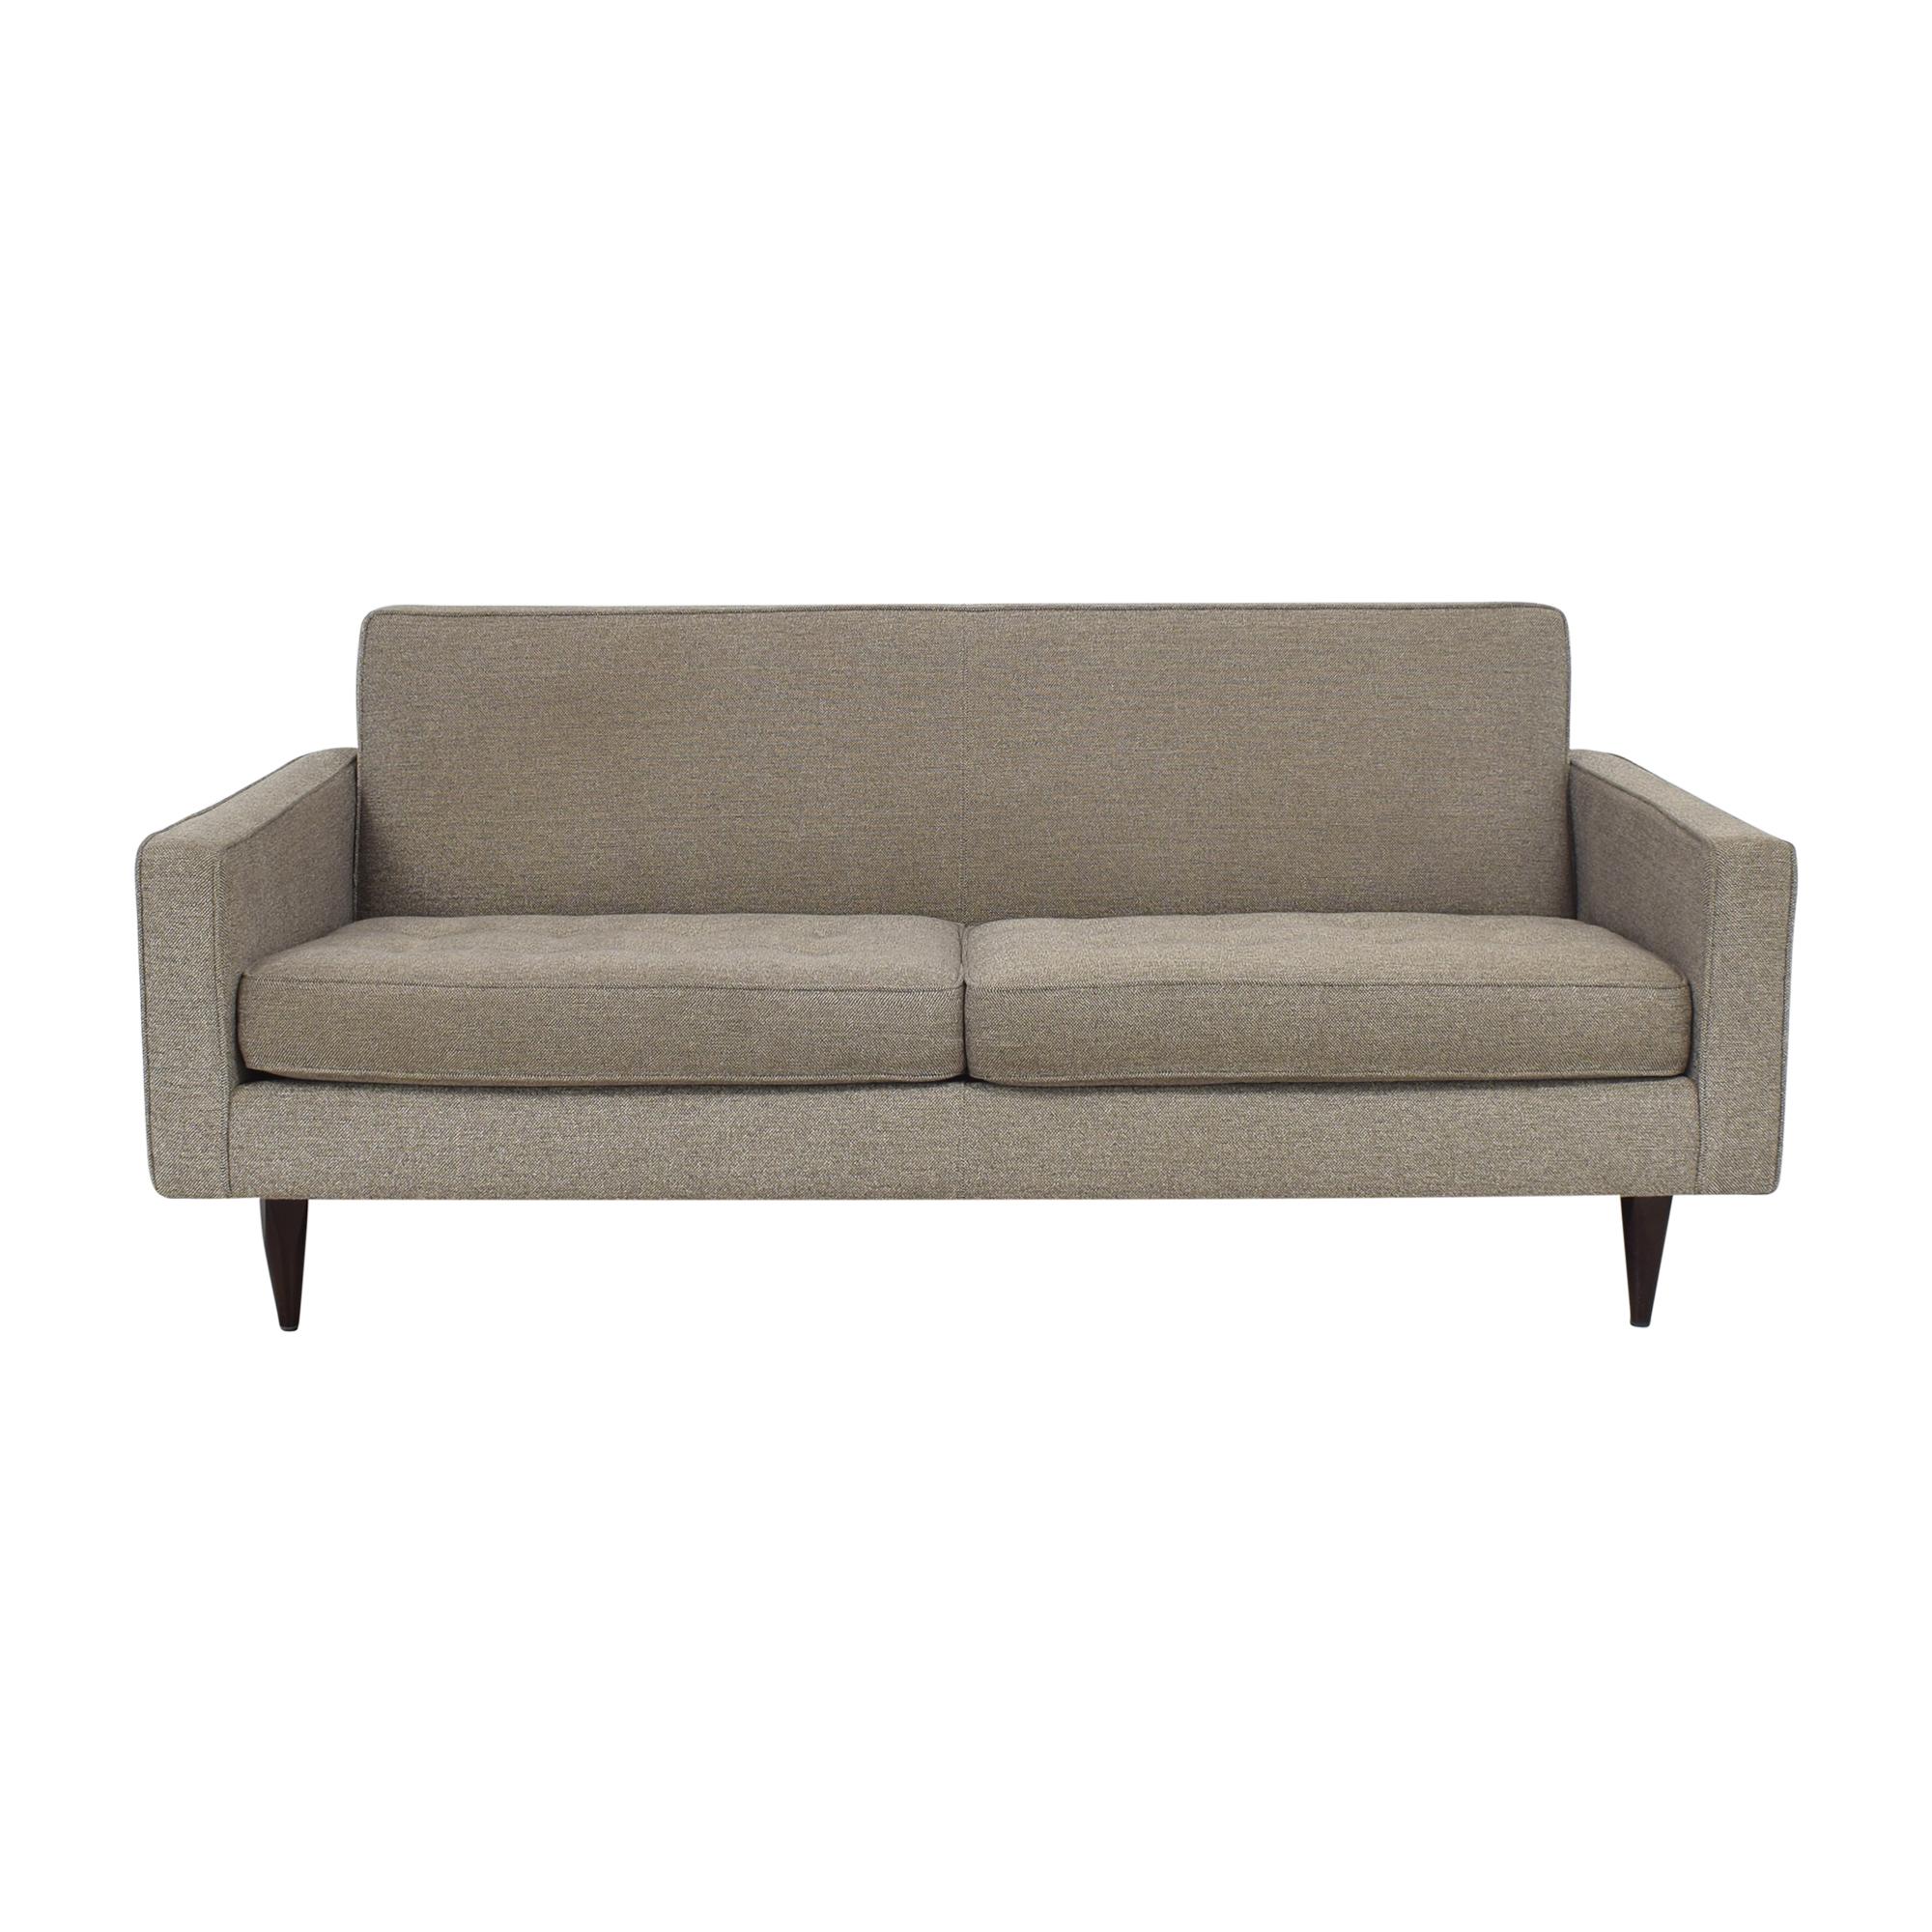 Room & Board Room & Board Reese Two Cushion Sofa discount